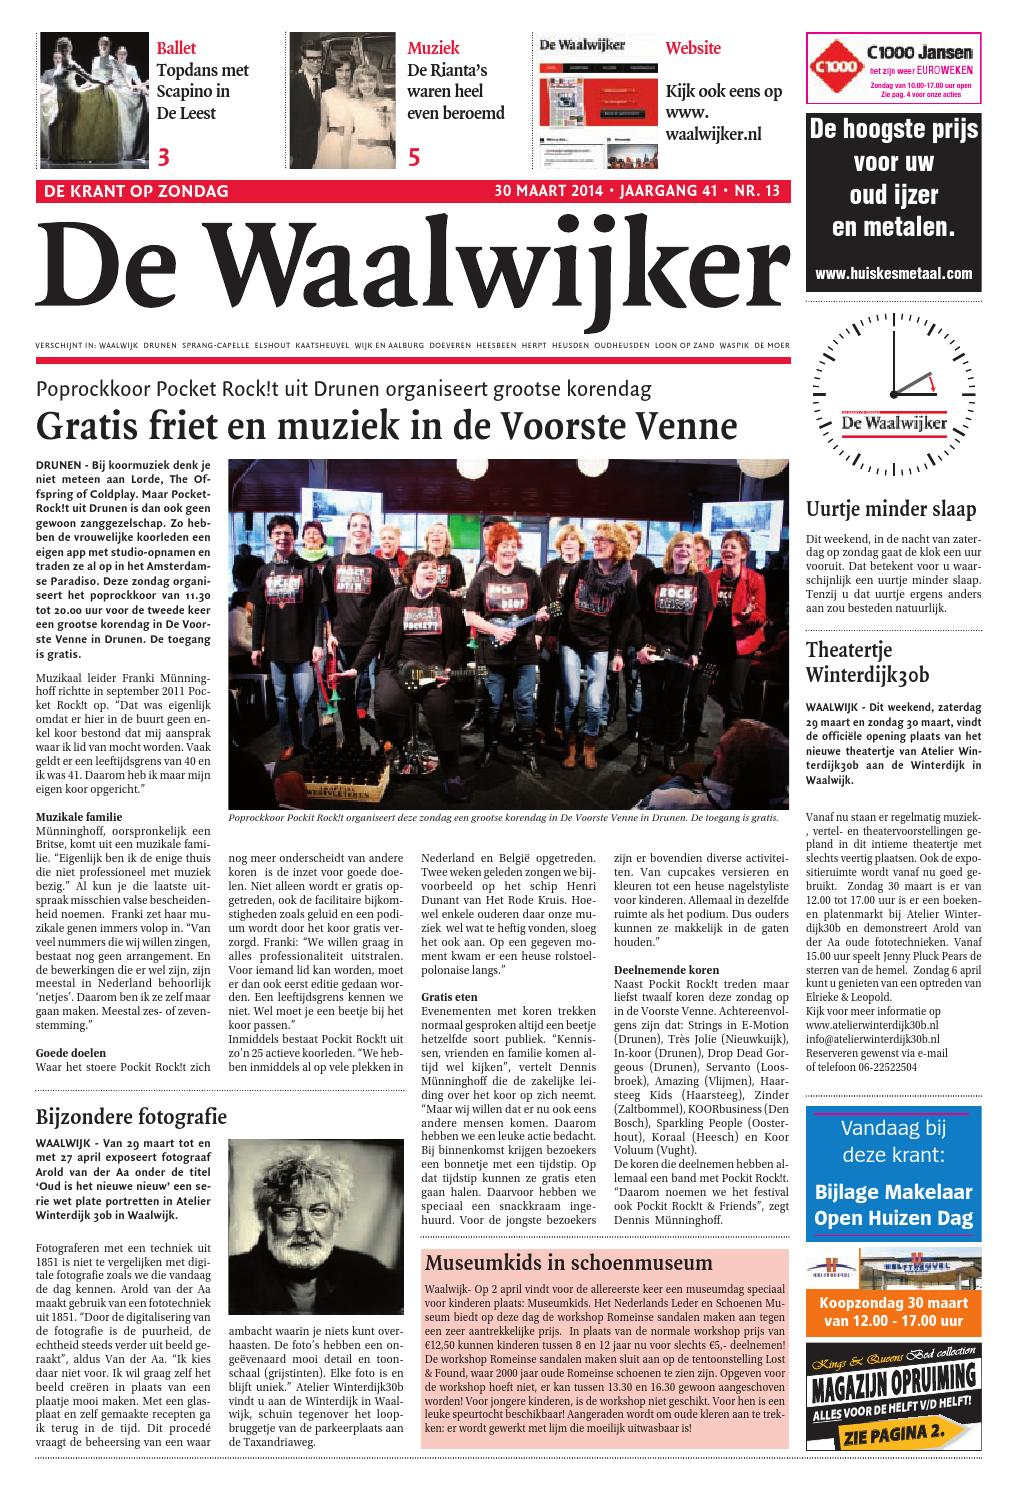 b10a74dbf33 Ww week13 2014 by De Persgroep Nederland - issuu